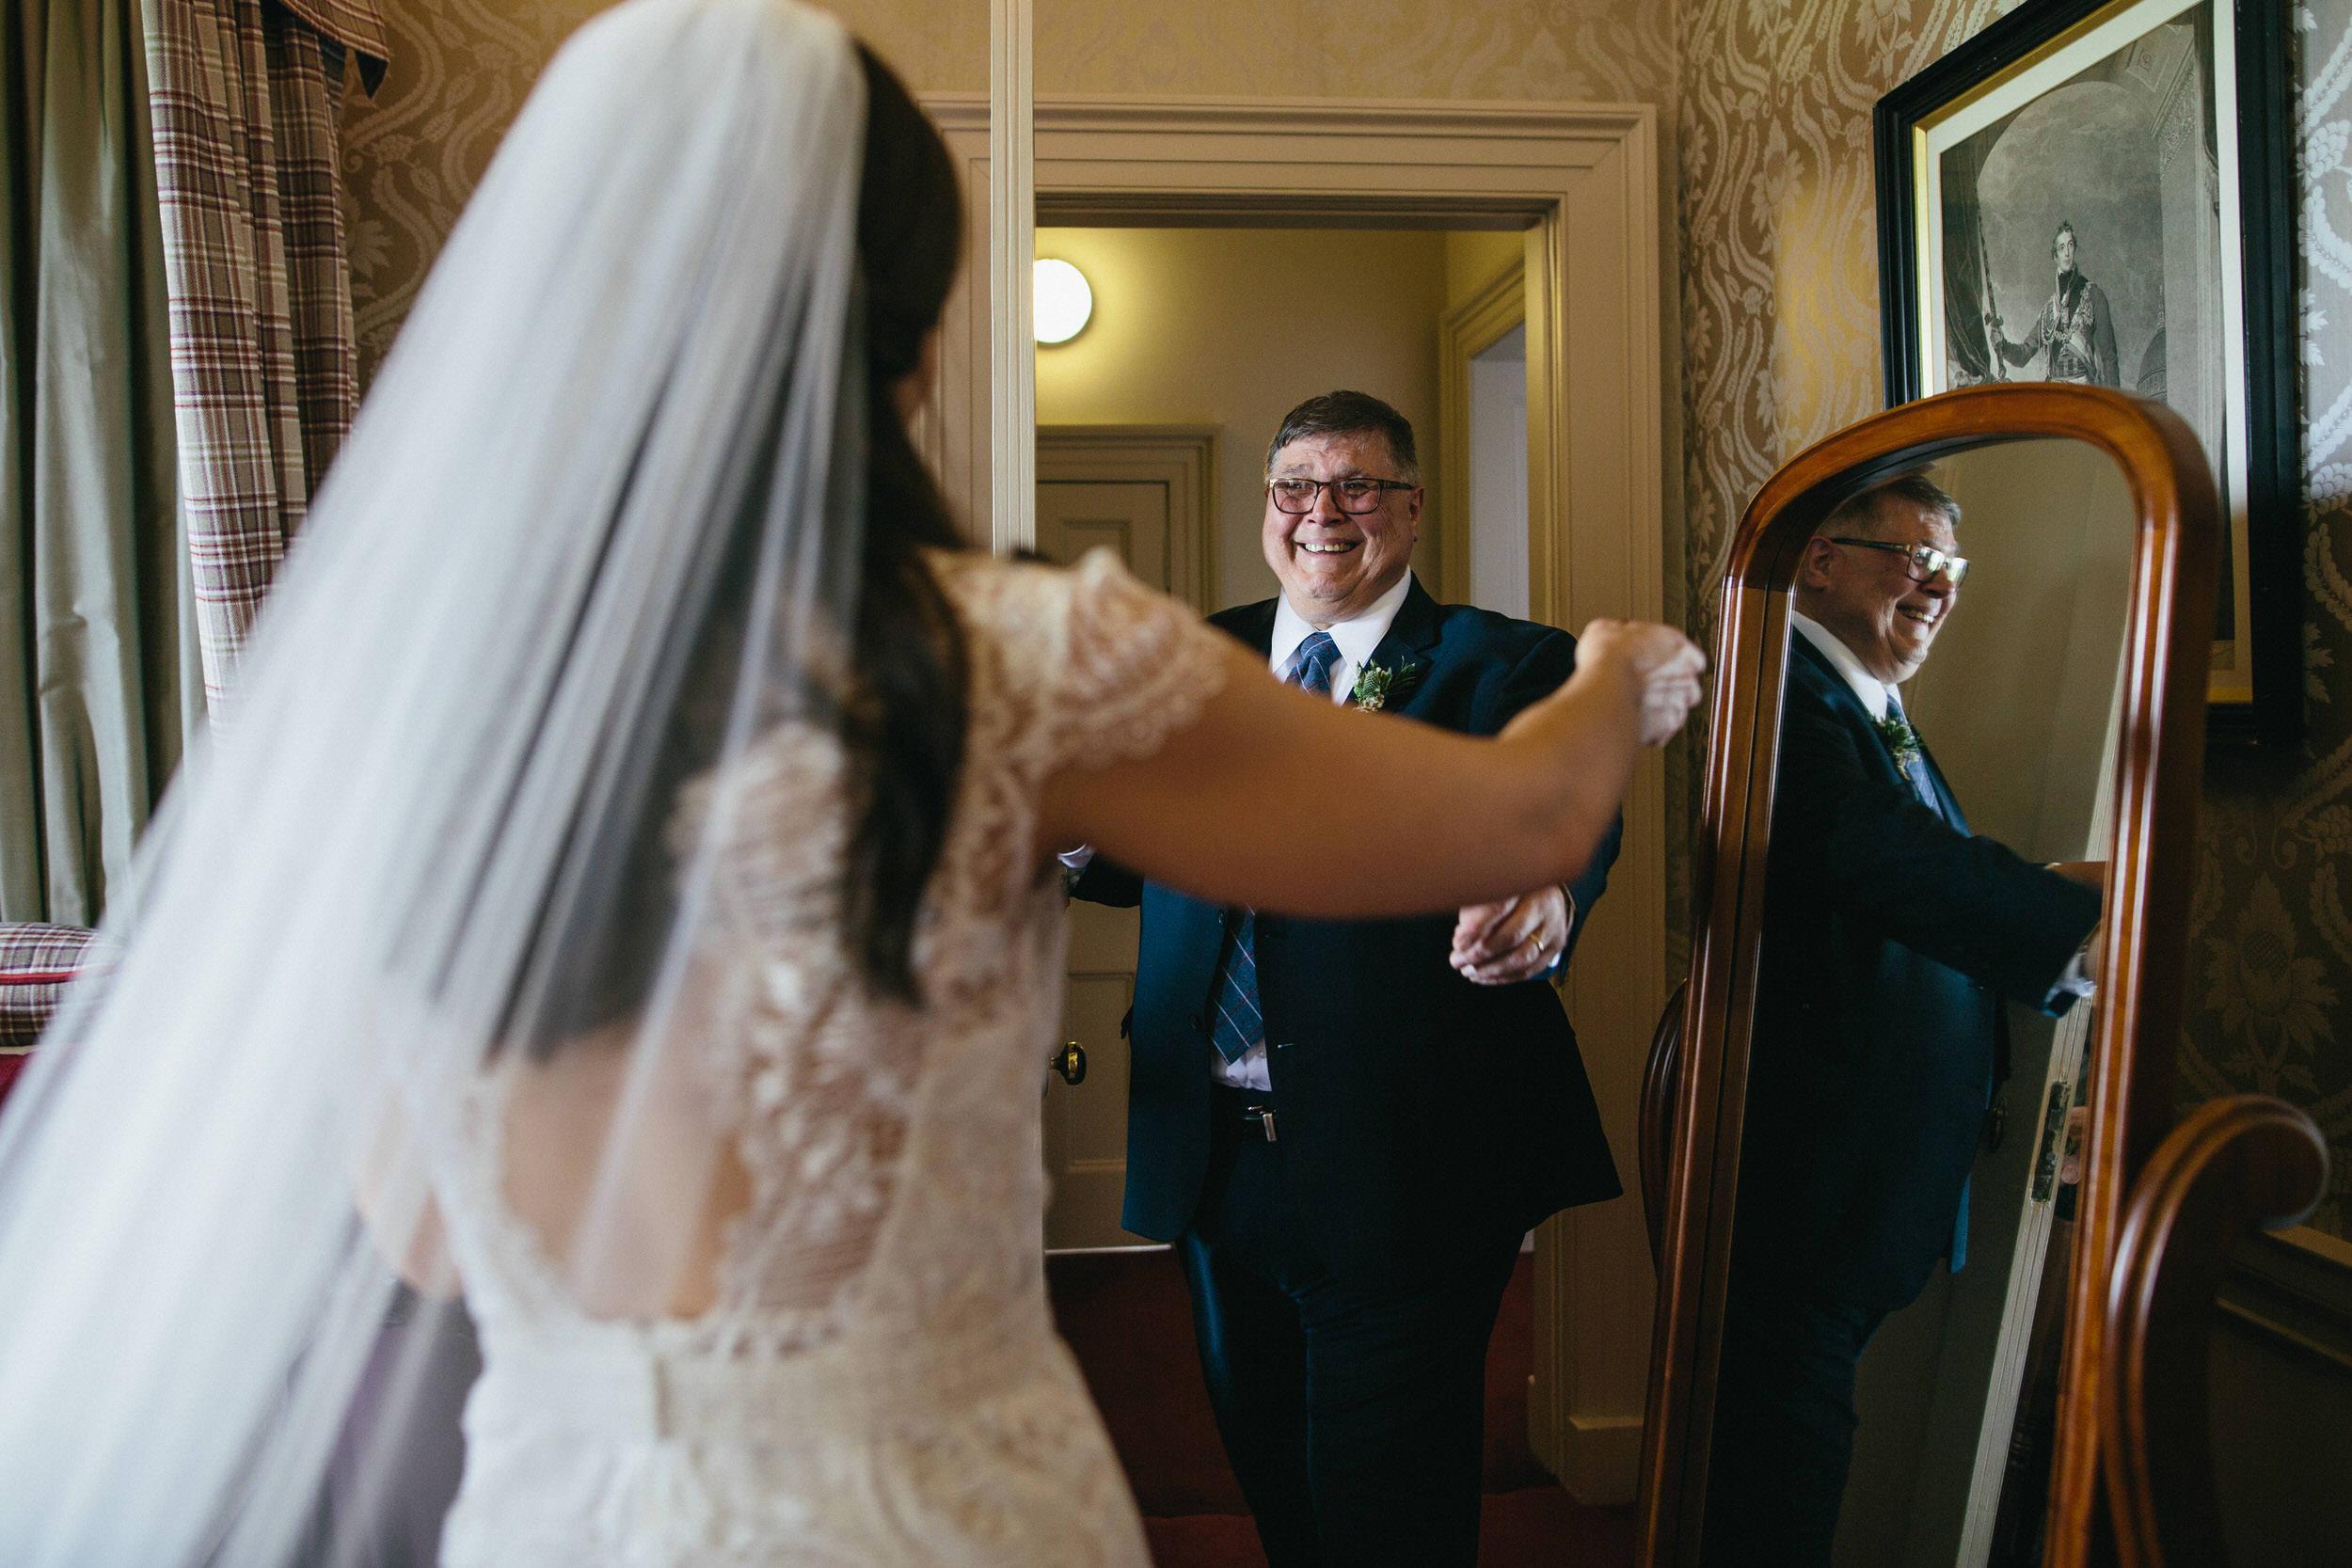 Quirky Wedding Photographer Scotland Glasgow Edinburgh Mirrorbox 051.jpg